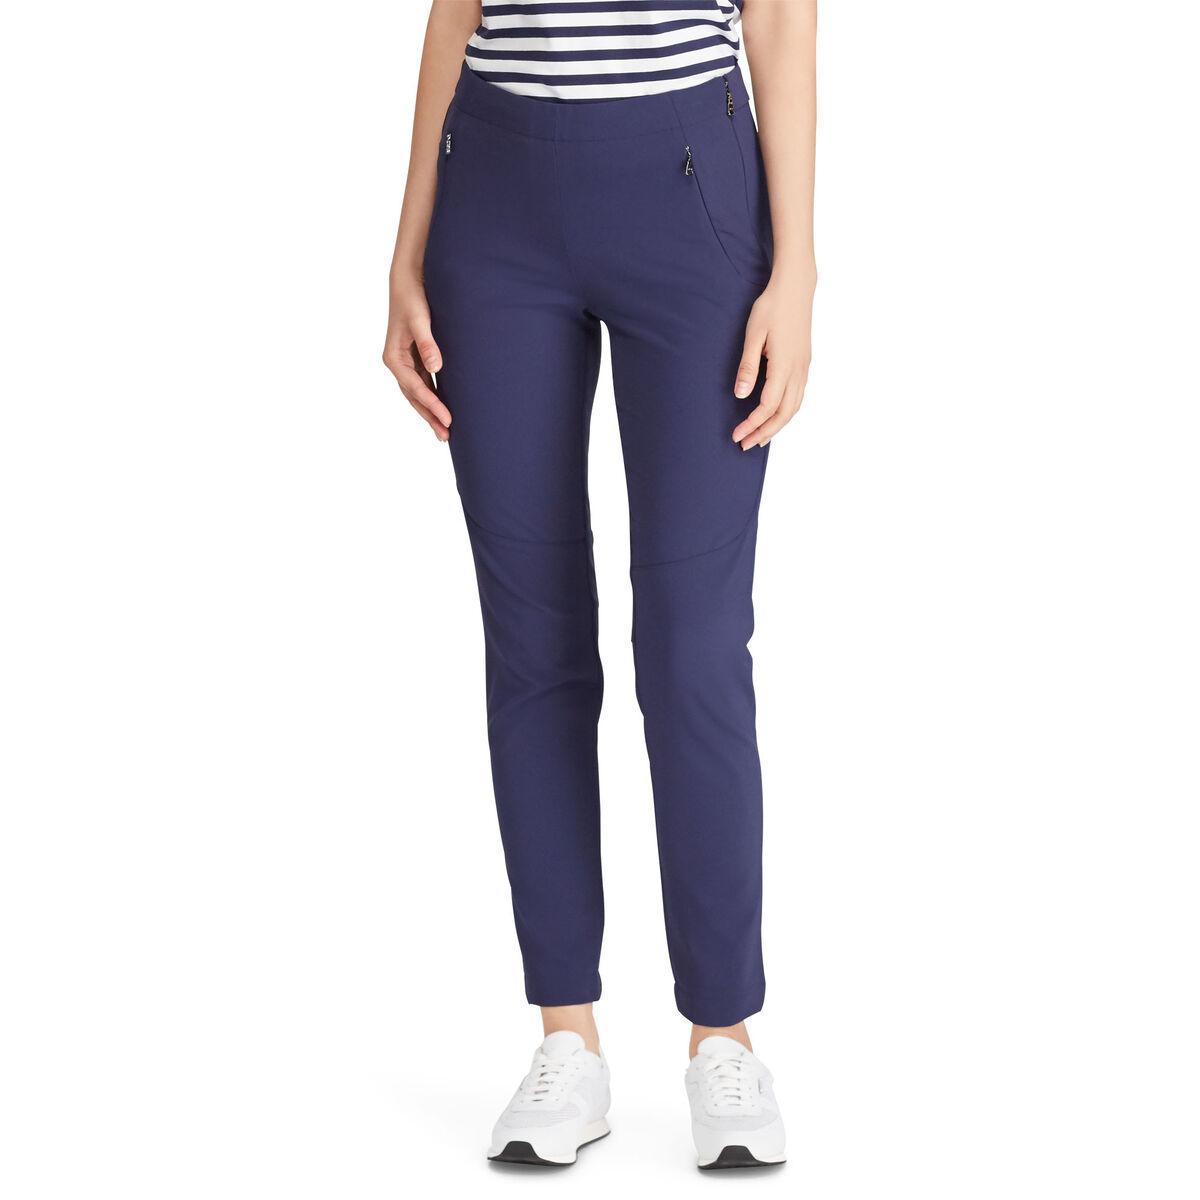 c252e415a6095 RLX Golf Stretch Twill Skinny Pant